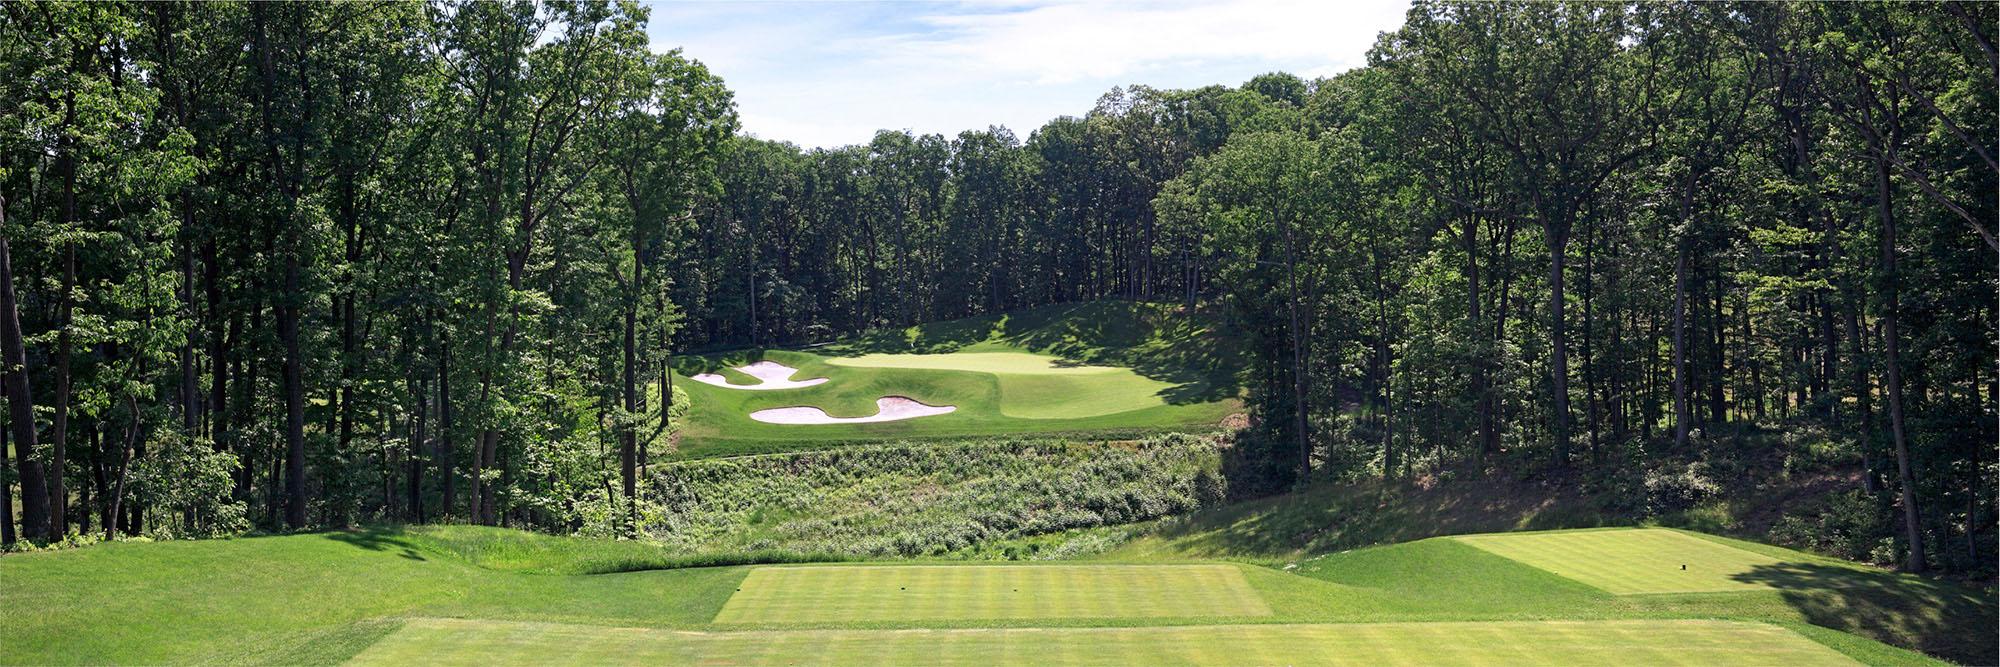 Golf Course Image - LedgeRock Golf Club No. 4